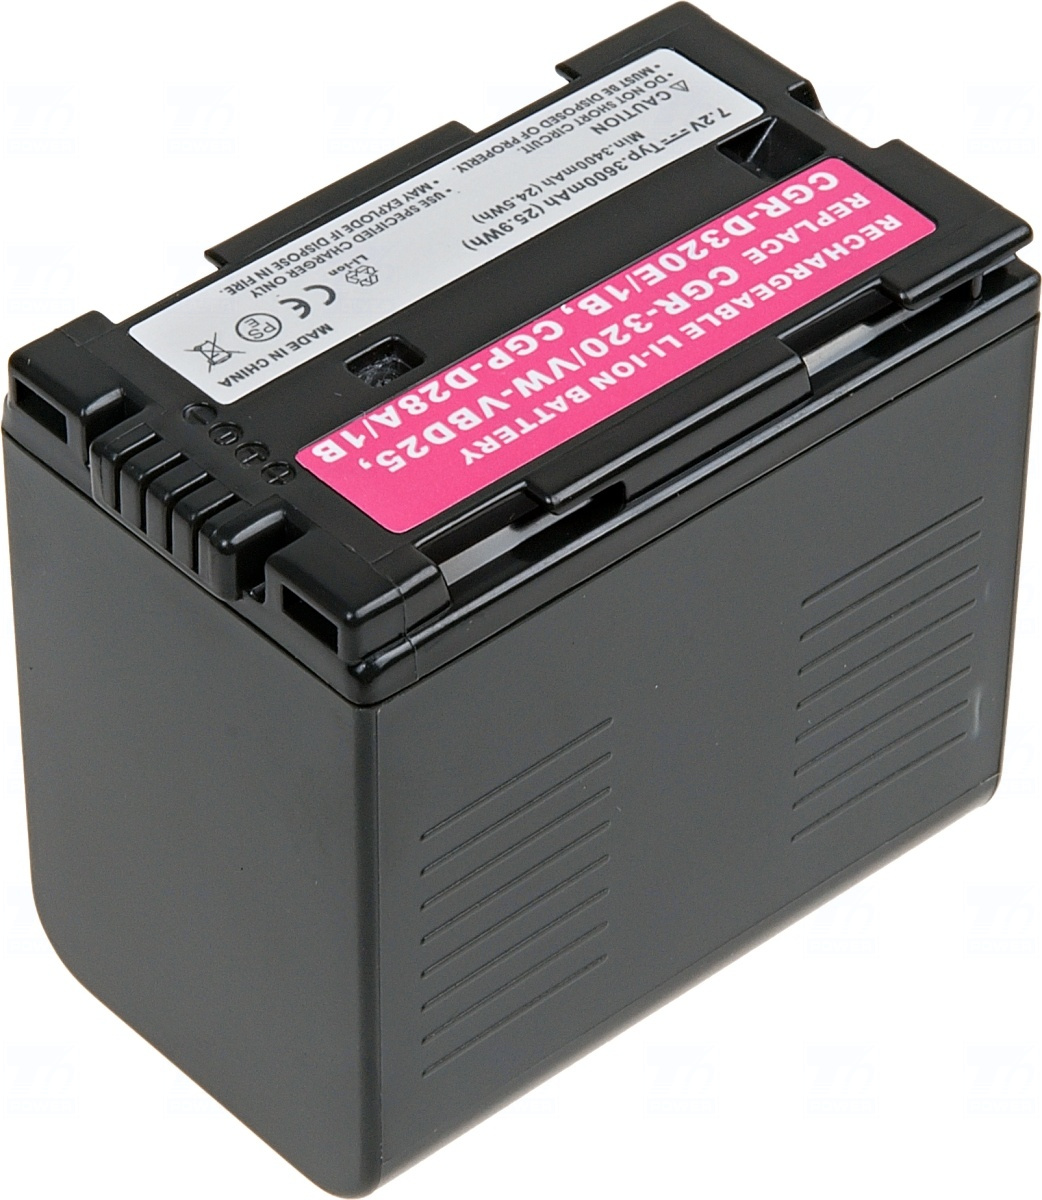 T6 power Baterie T6 power CGR-D320, VW-VBD25, CGR-D28A/1B, CGP-D